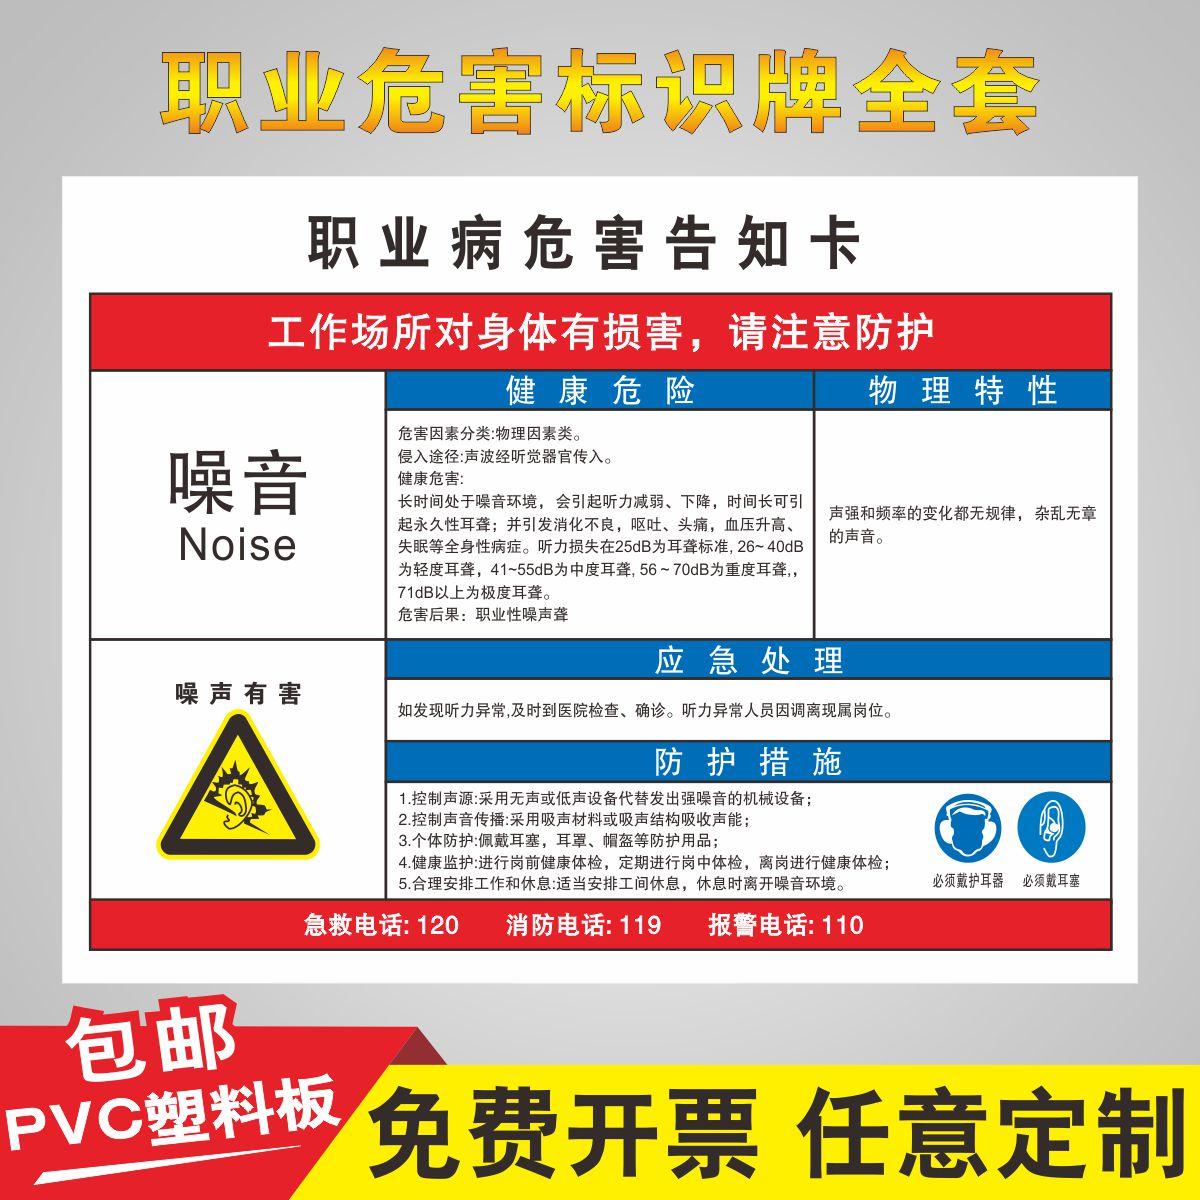 Dust occupational hazards notification card factory workshop noise harmful paint sulfuric acid hydrochloric acid identification brand customization